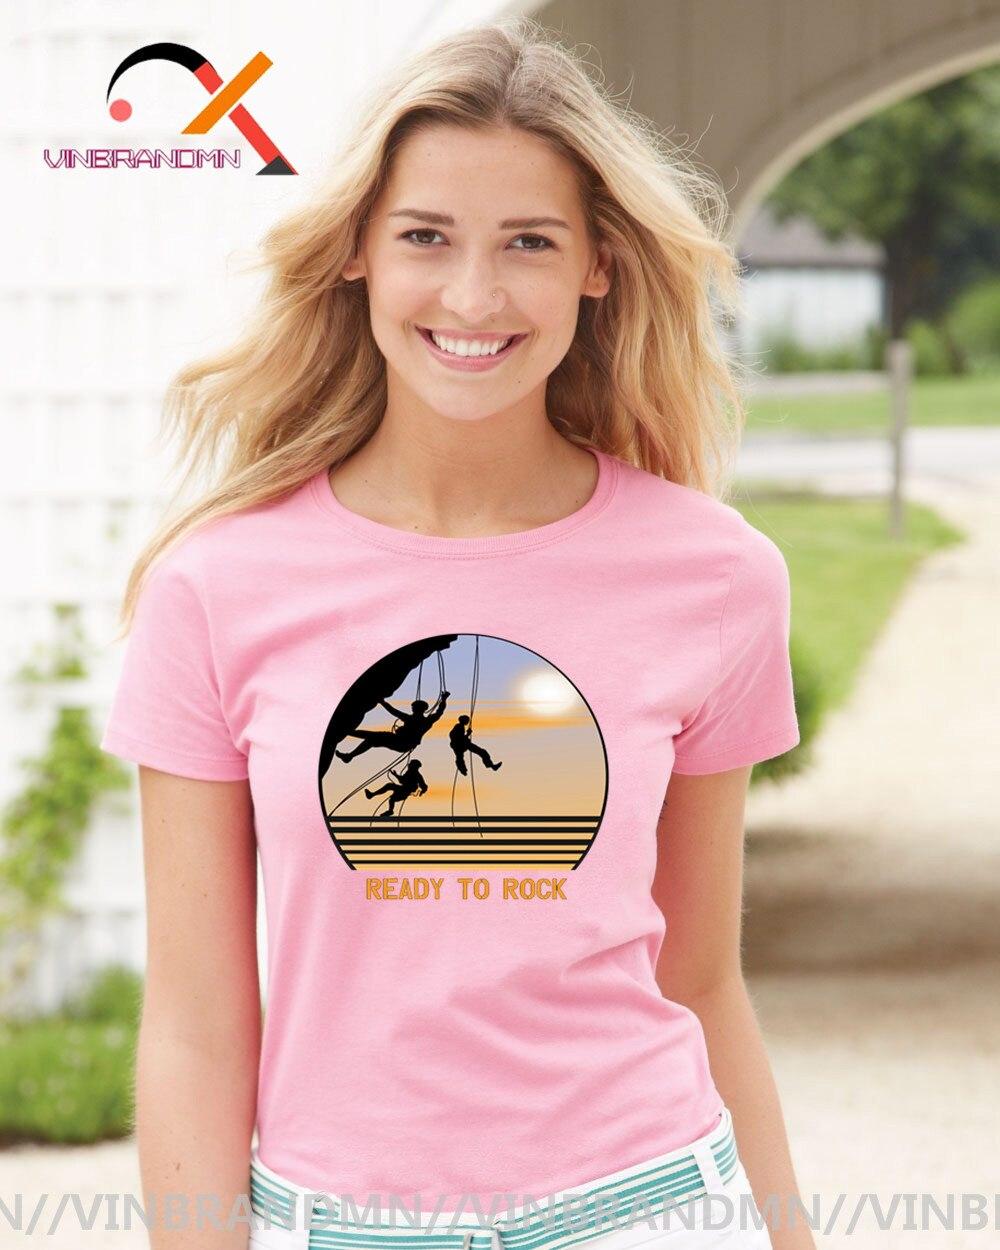 2020 Vintage Rock Climbing Camisetas Mujer Cool montaña senderismo camiseta Regalos divertidos para Deportes Aventura Climber Tees Camisetas